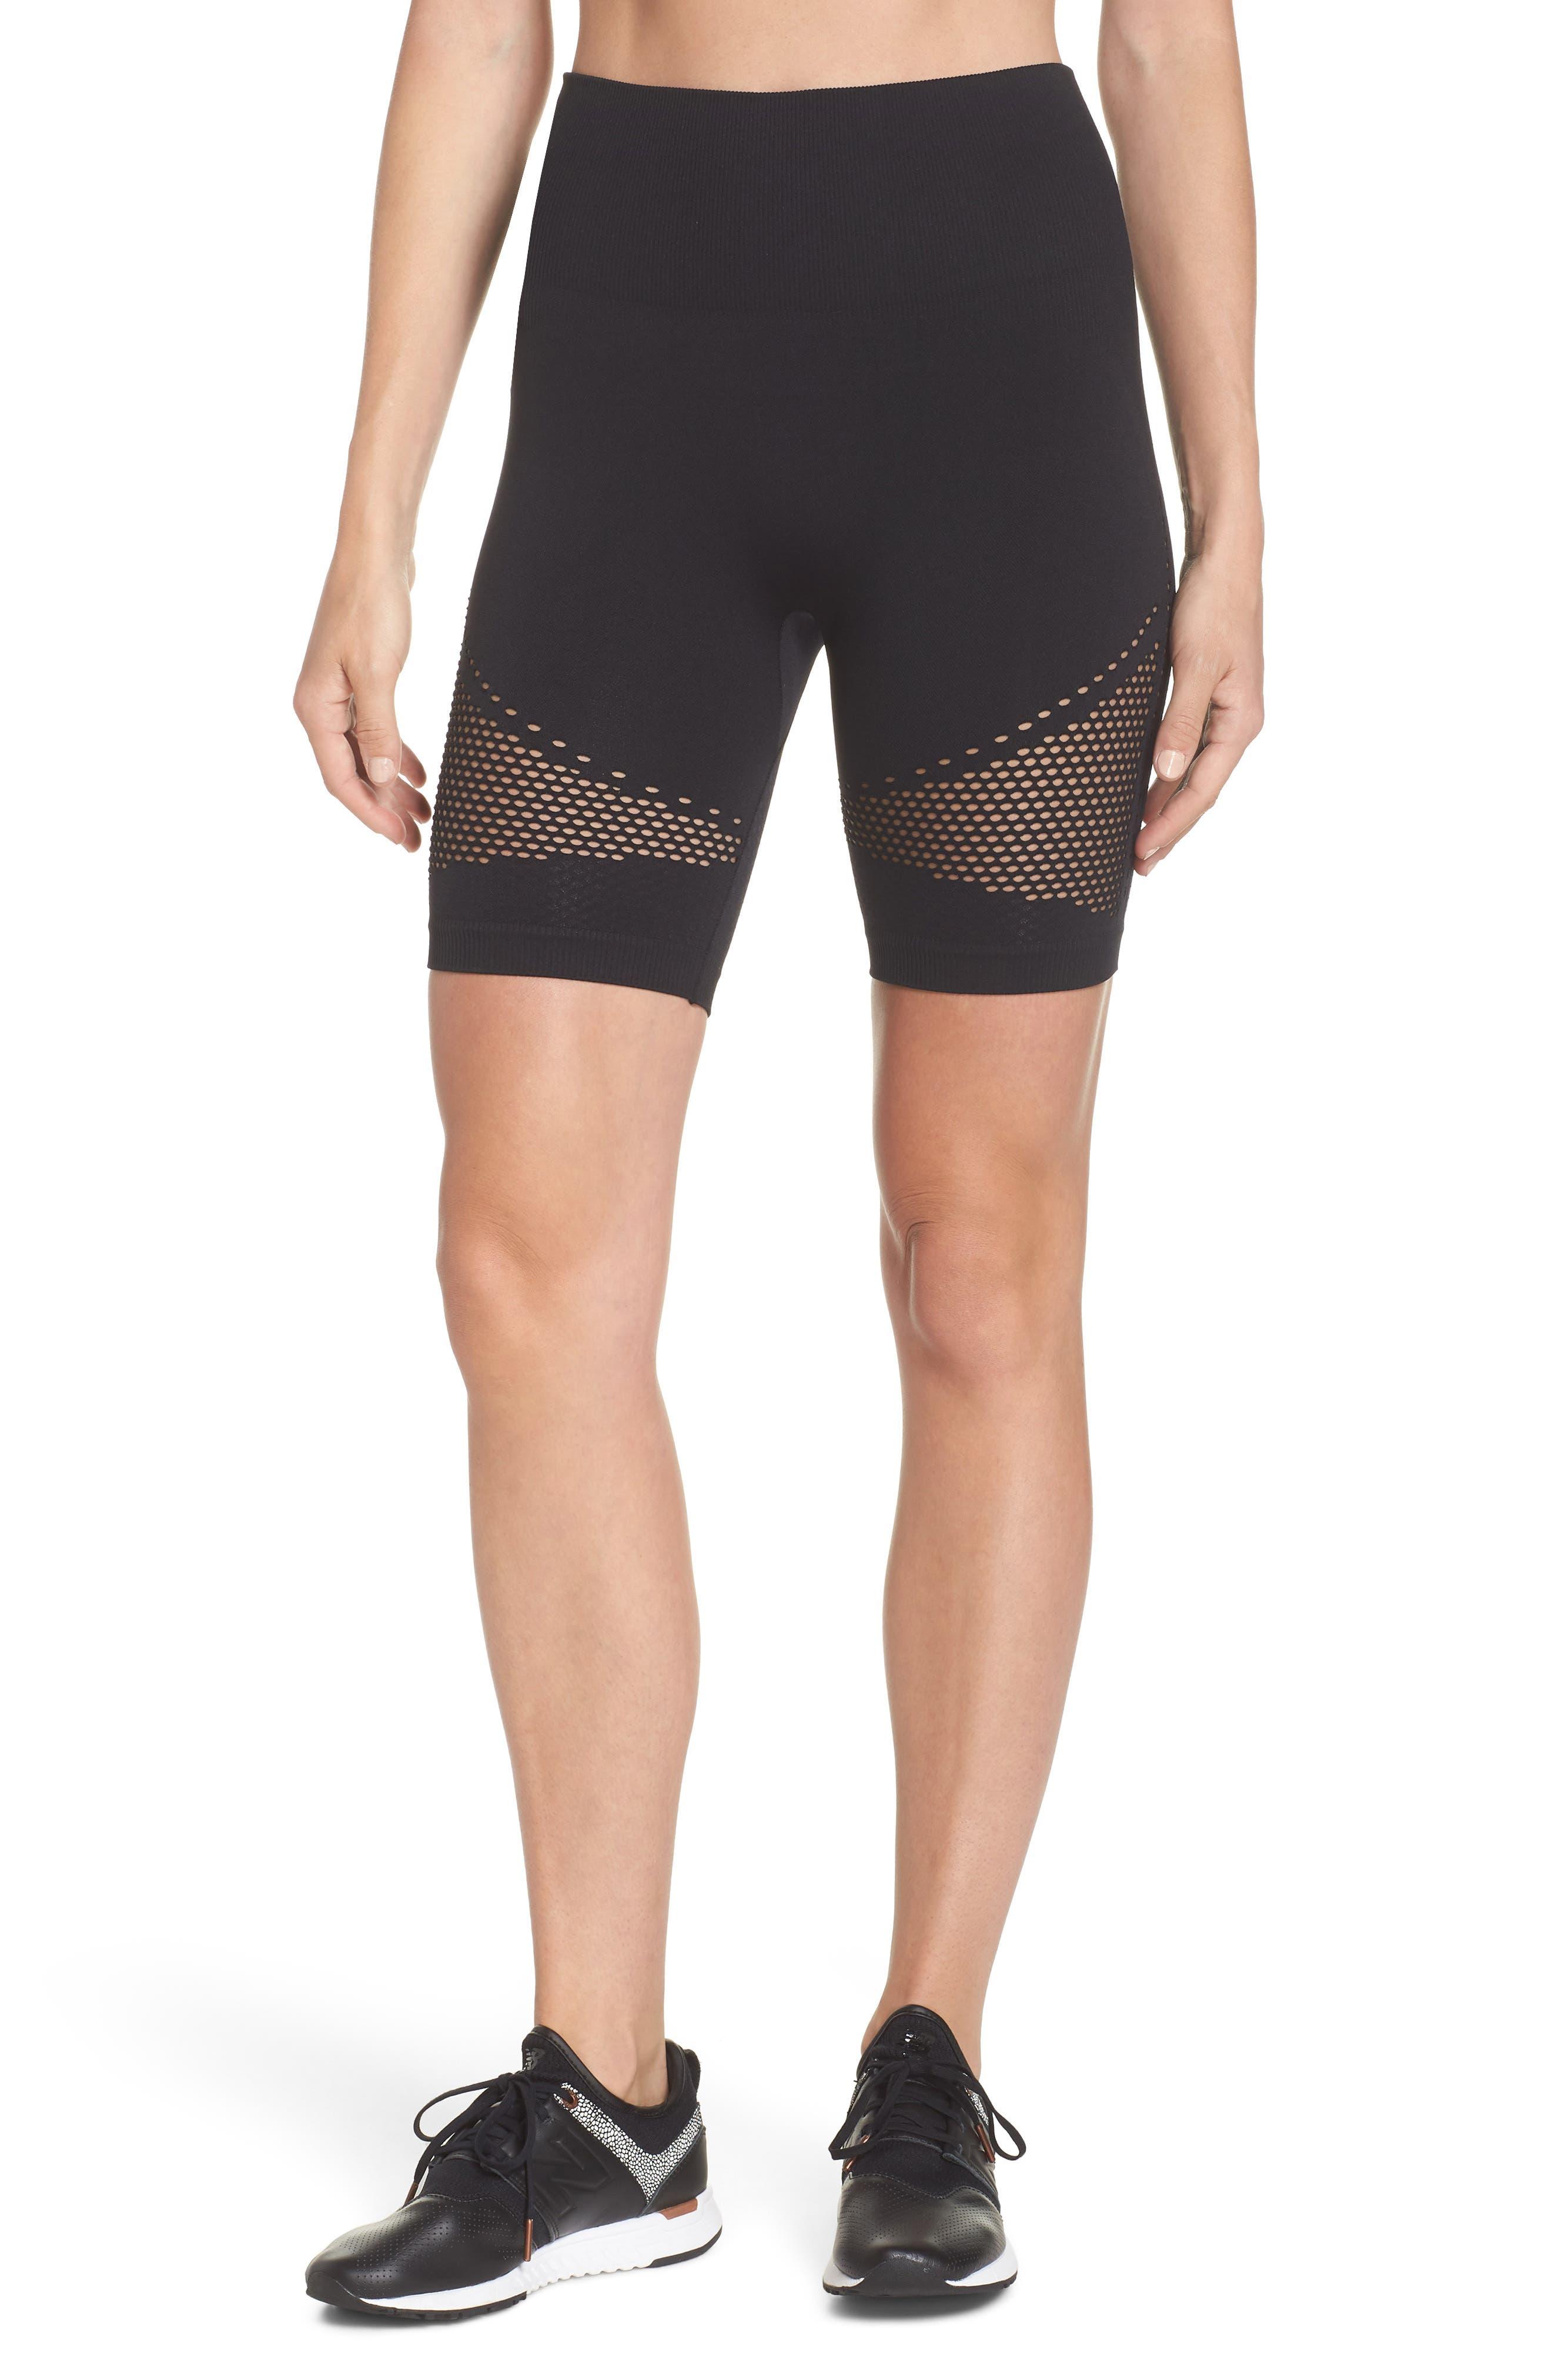 Climawear Momentum Seamless Shorts